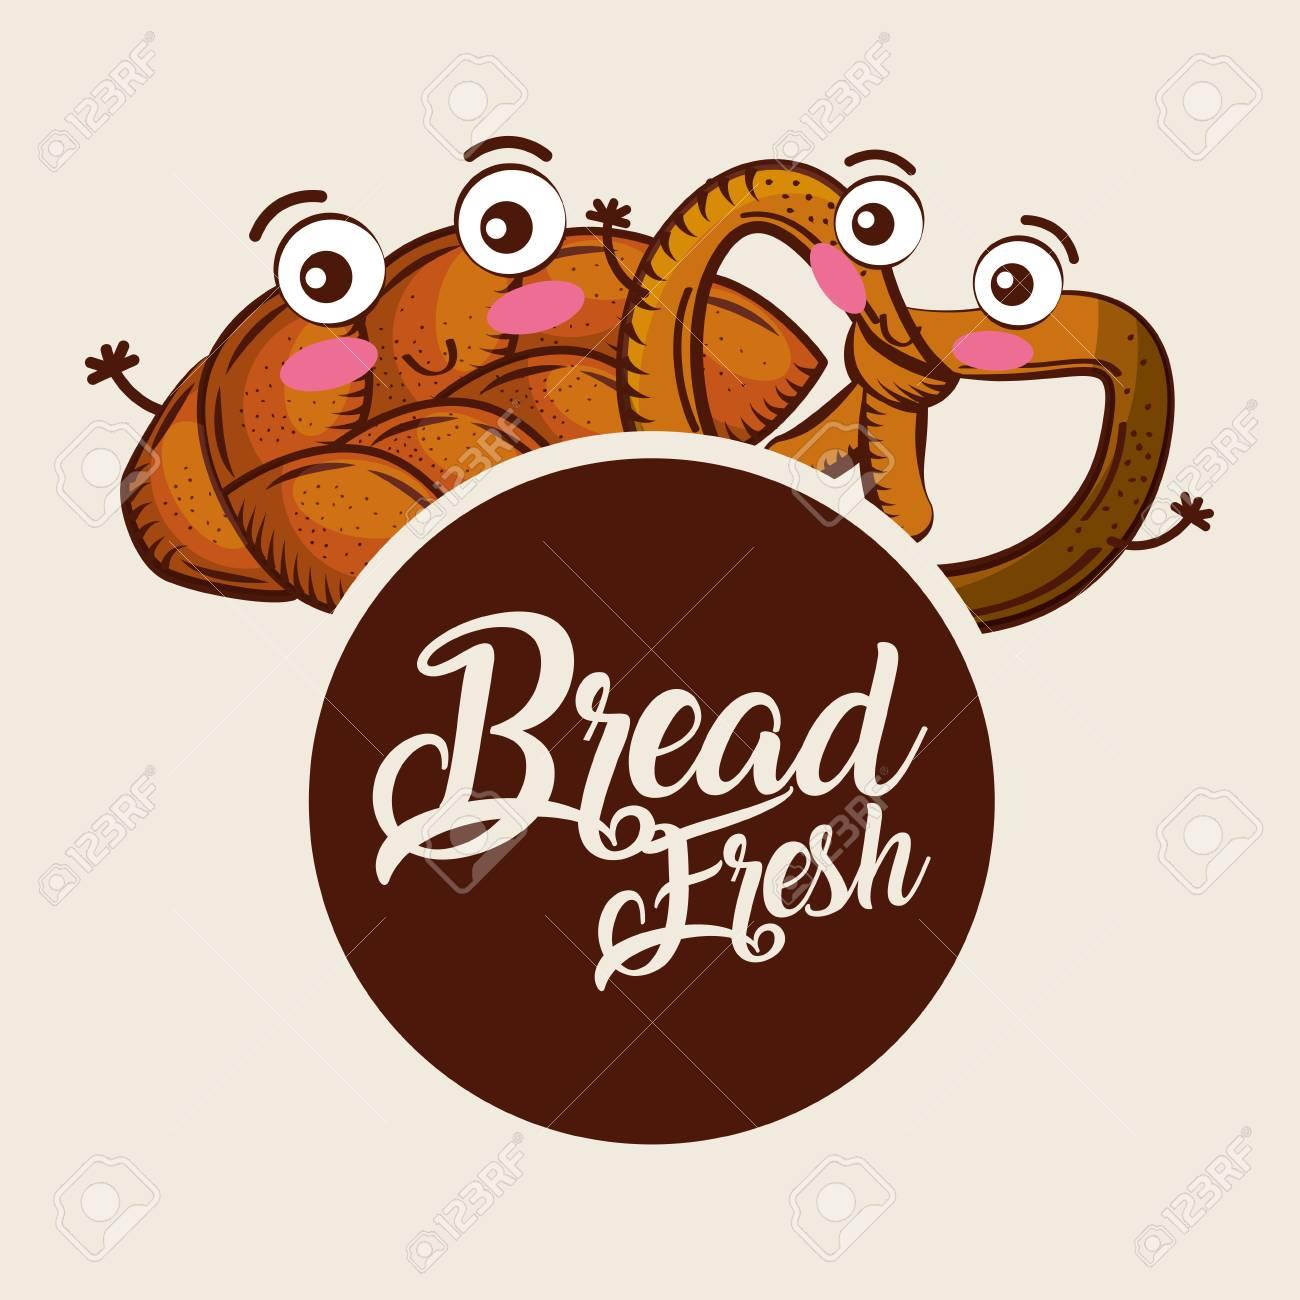 bread fresh whole pretzel cartoon food label vector illustration